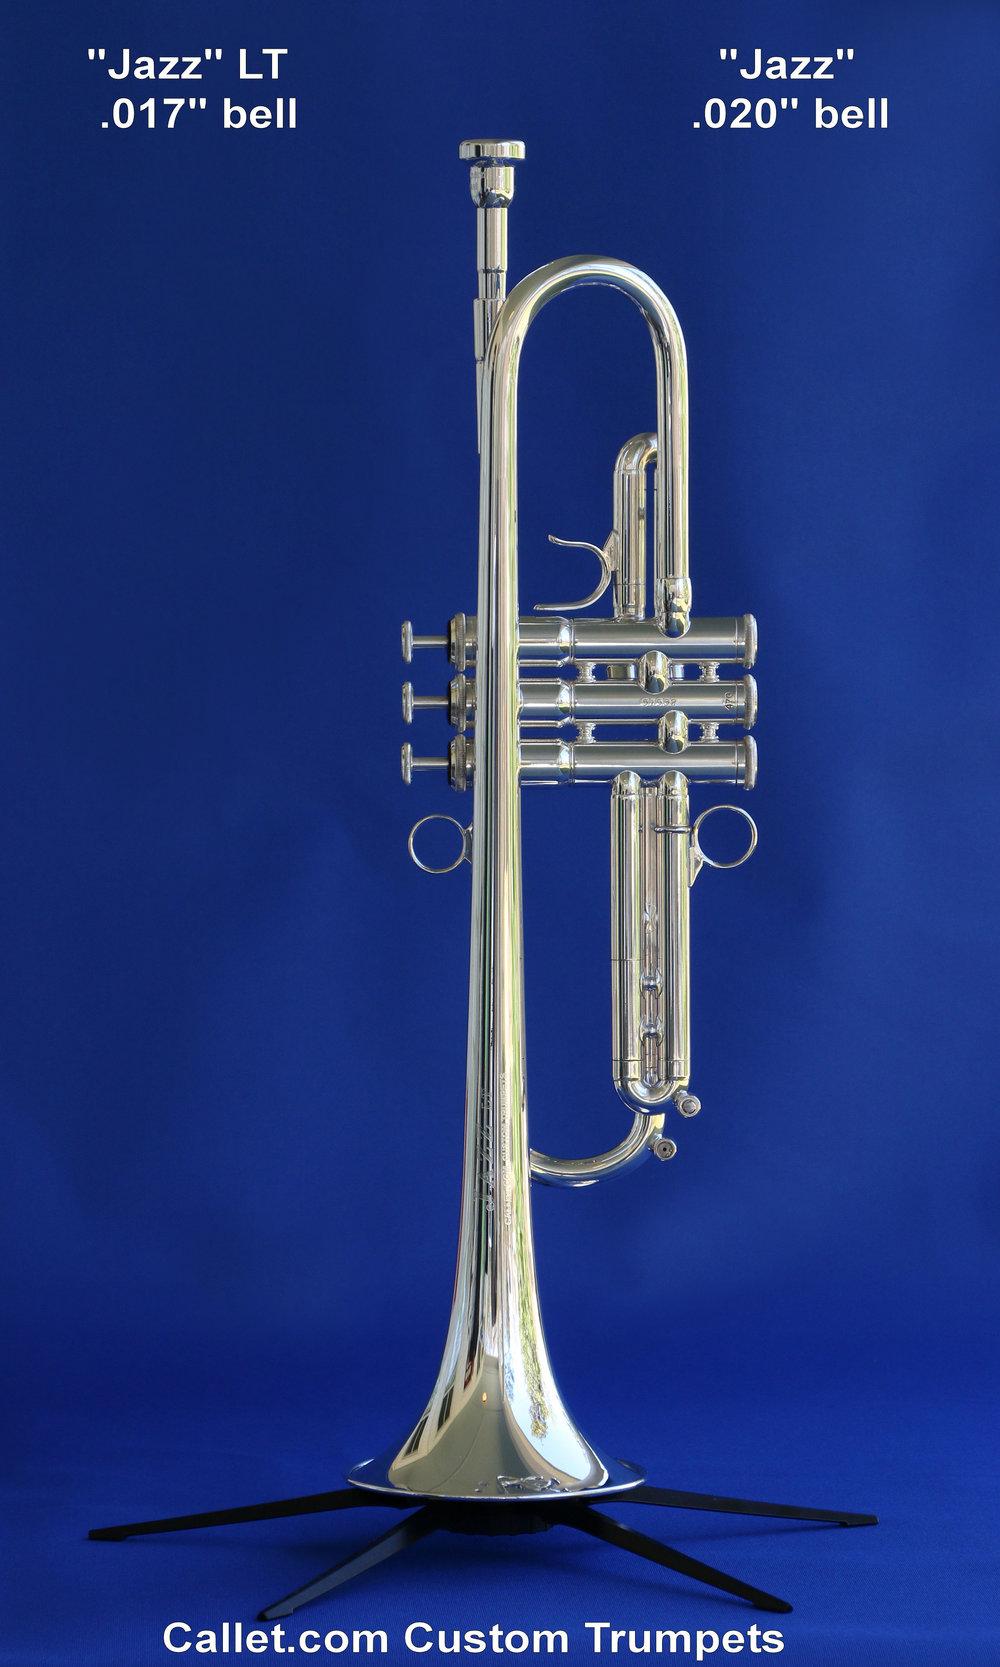 Callet Jazz LT 300 corel.jpg